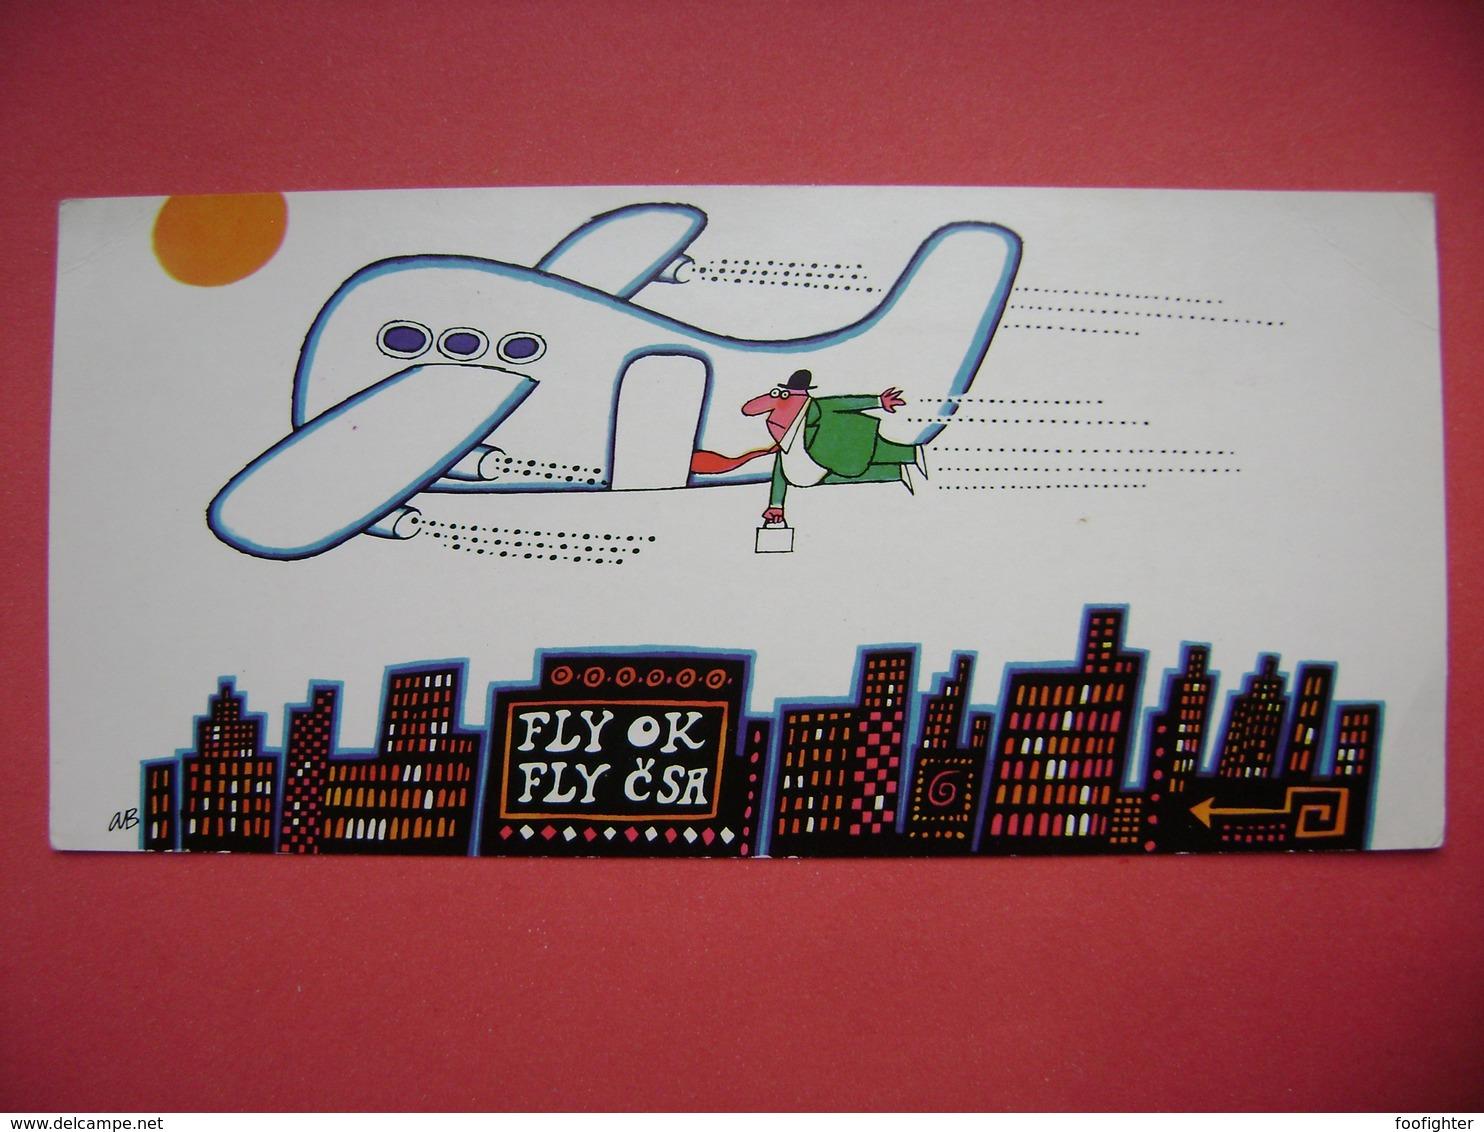 Czechoslovakia - Fly OK * Fly CSA - Artist Adolf Born For Czechoslovak Airlines (Awards: Palmo D'oro Bordighera 1968) - Reclame